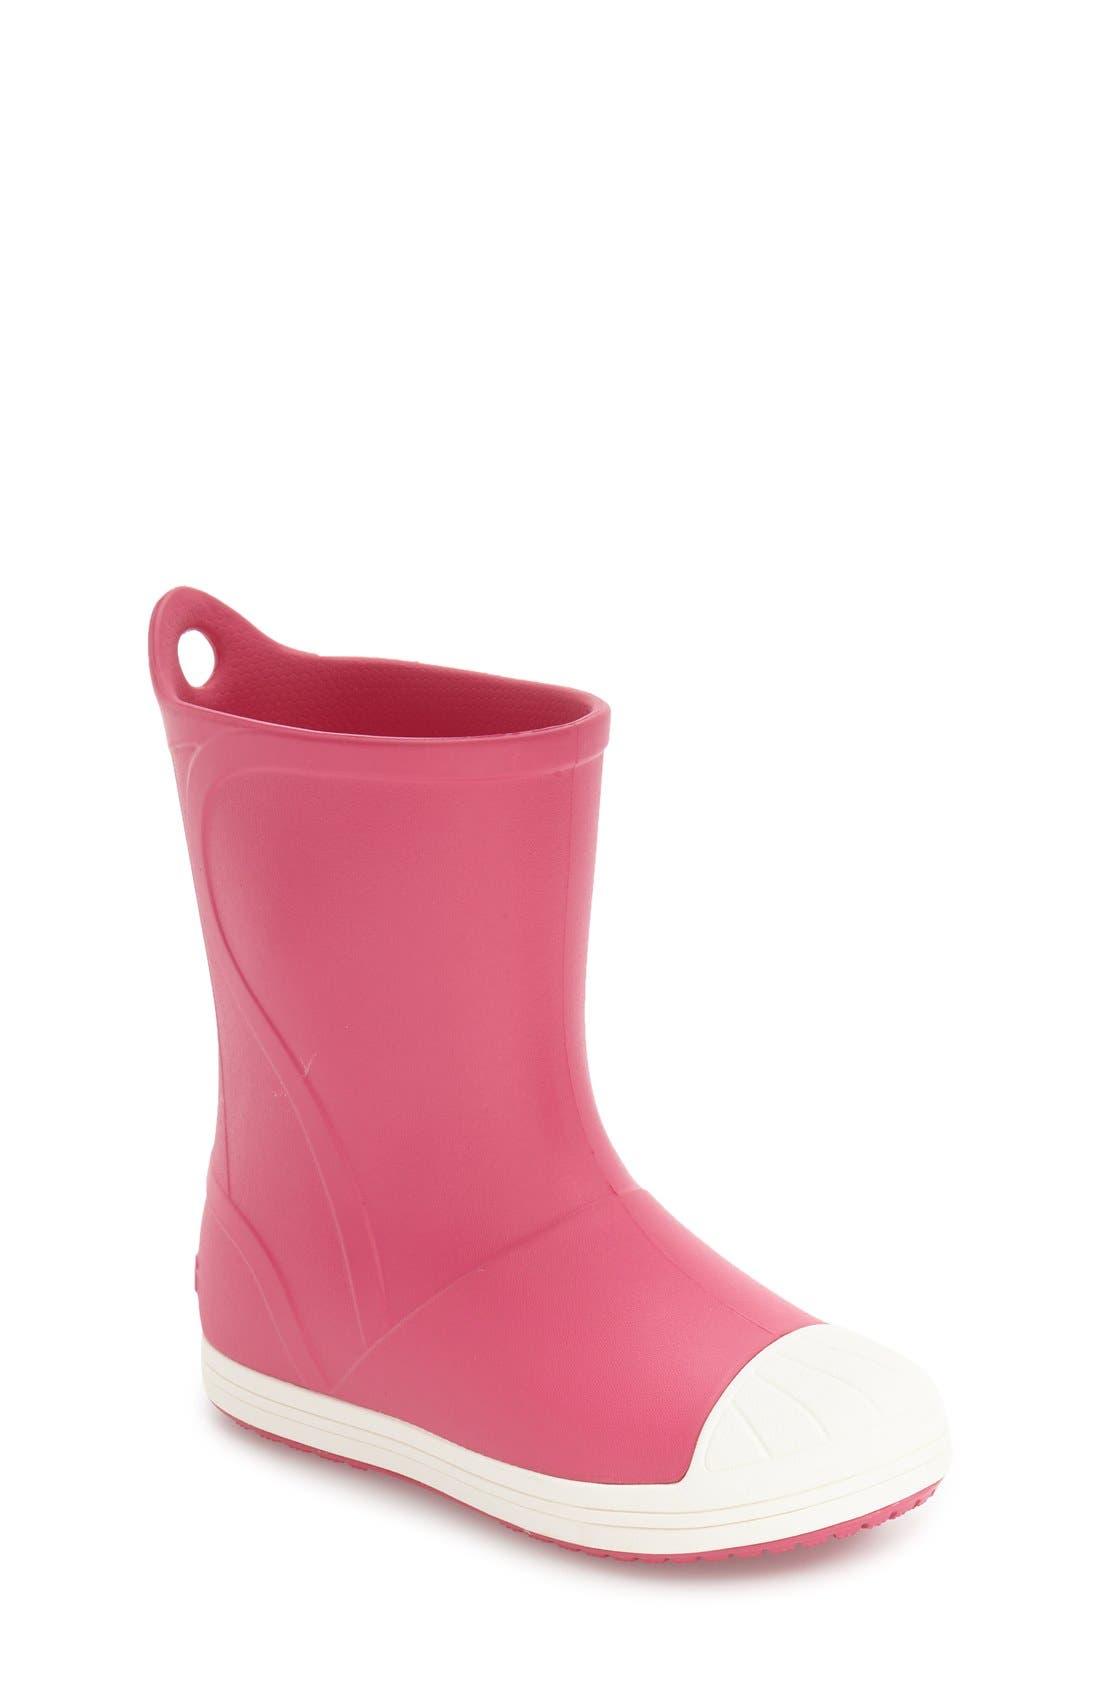 Bump It Waterproof Rain Boot,                             Main thumbnail 1, color,                             Candy Pink/ Oyster